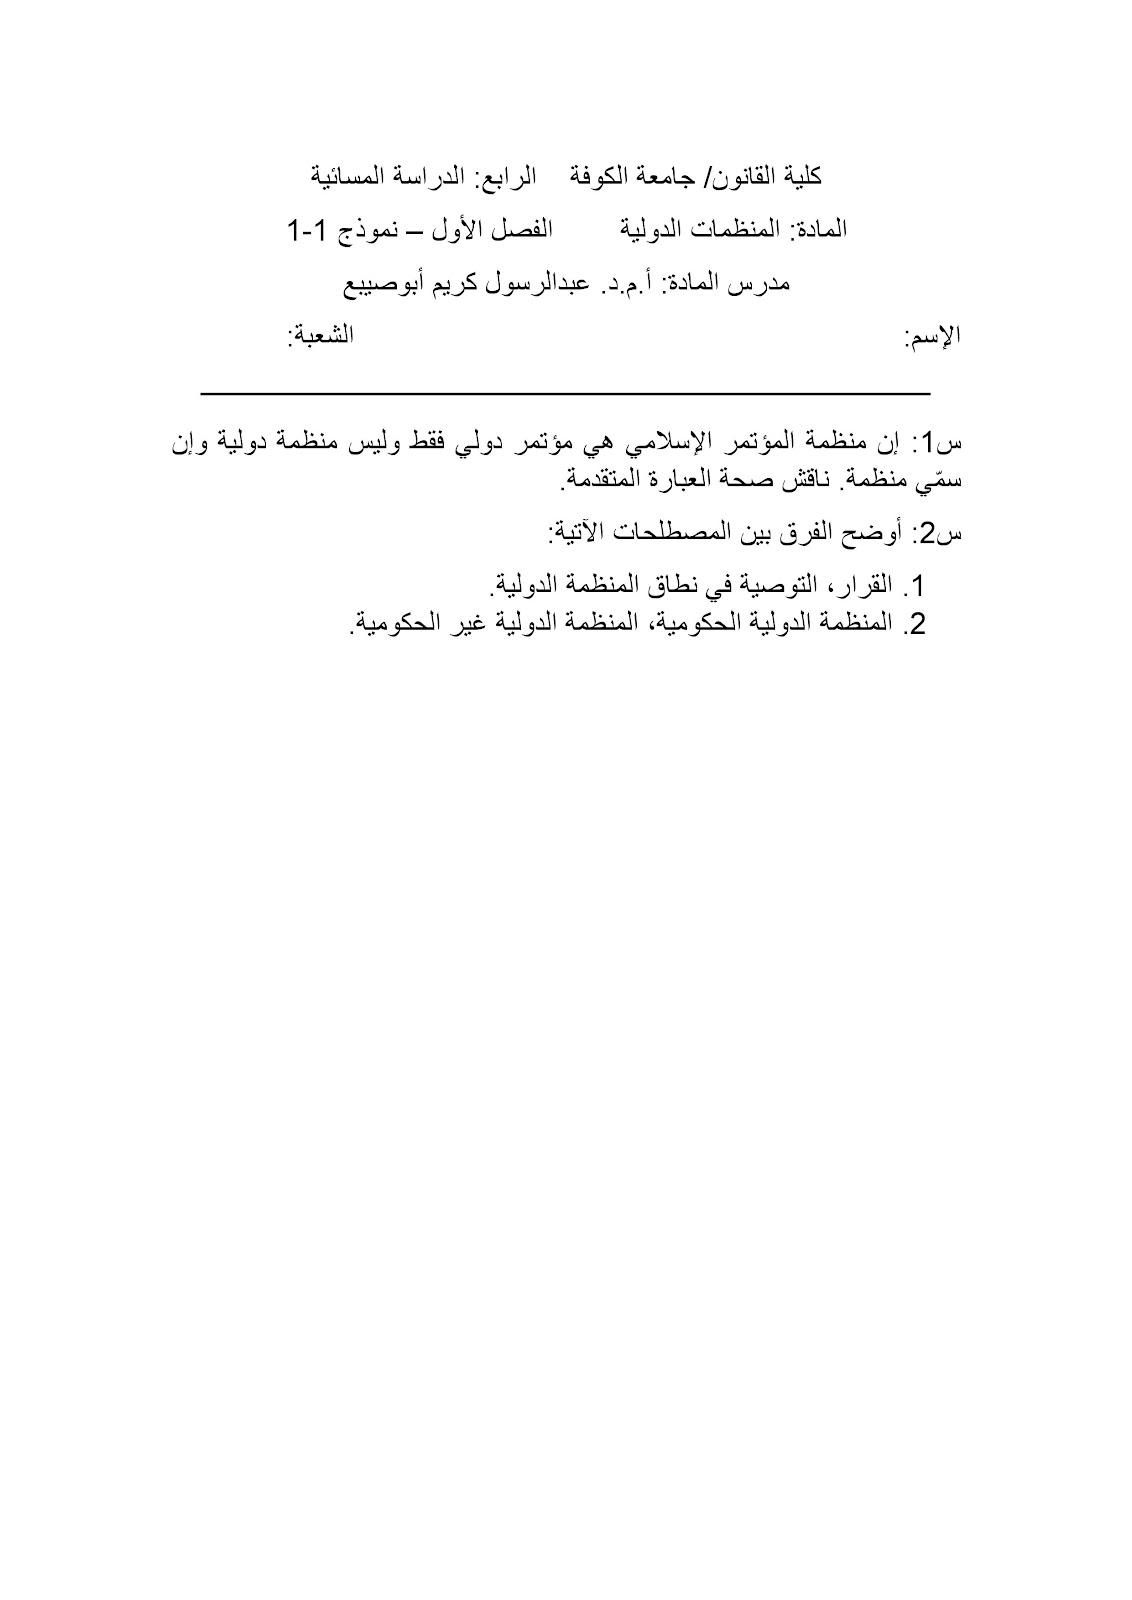 9.page1.jpg